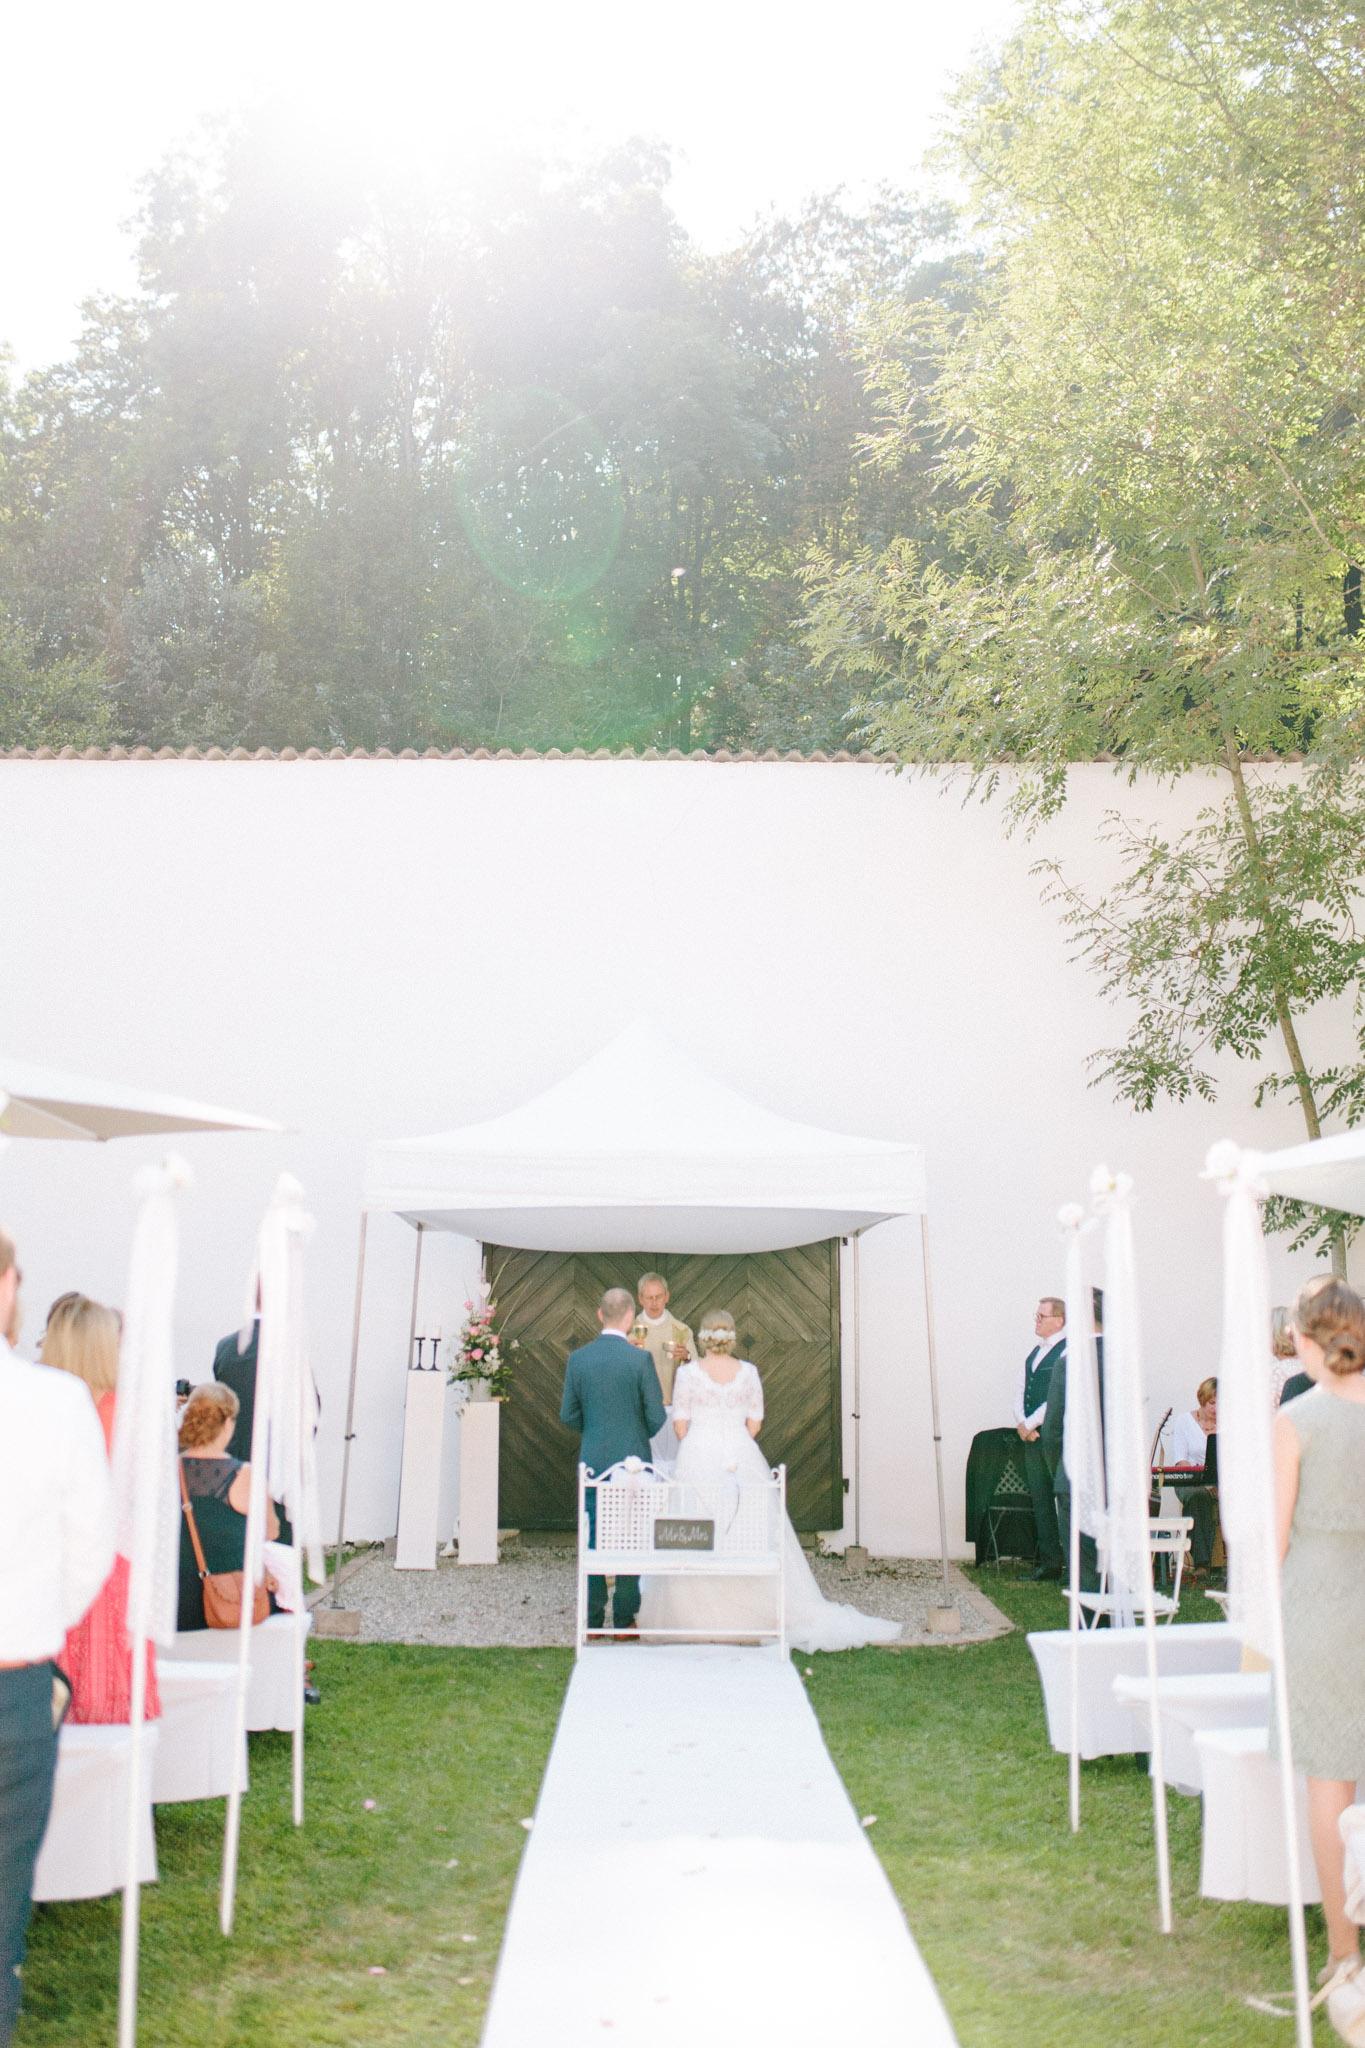 Lilienhof-Freiburg-Hochzeit-Pia-Anna-Christian-Wedding-Photography-FS-56.jpg